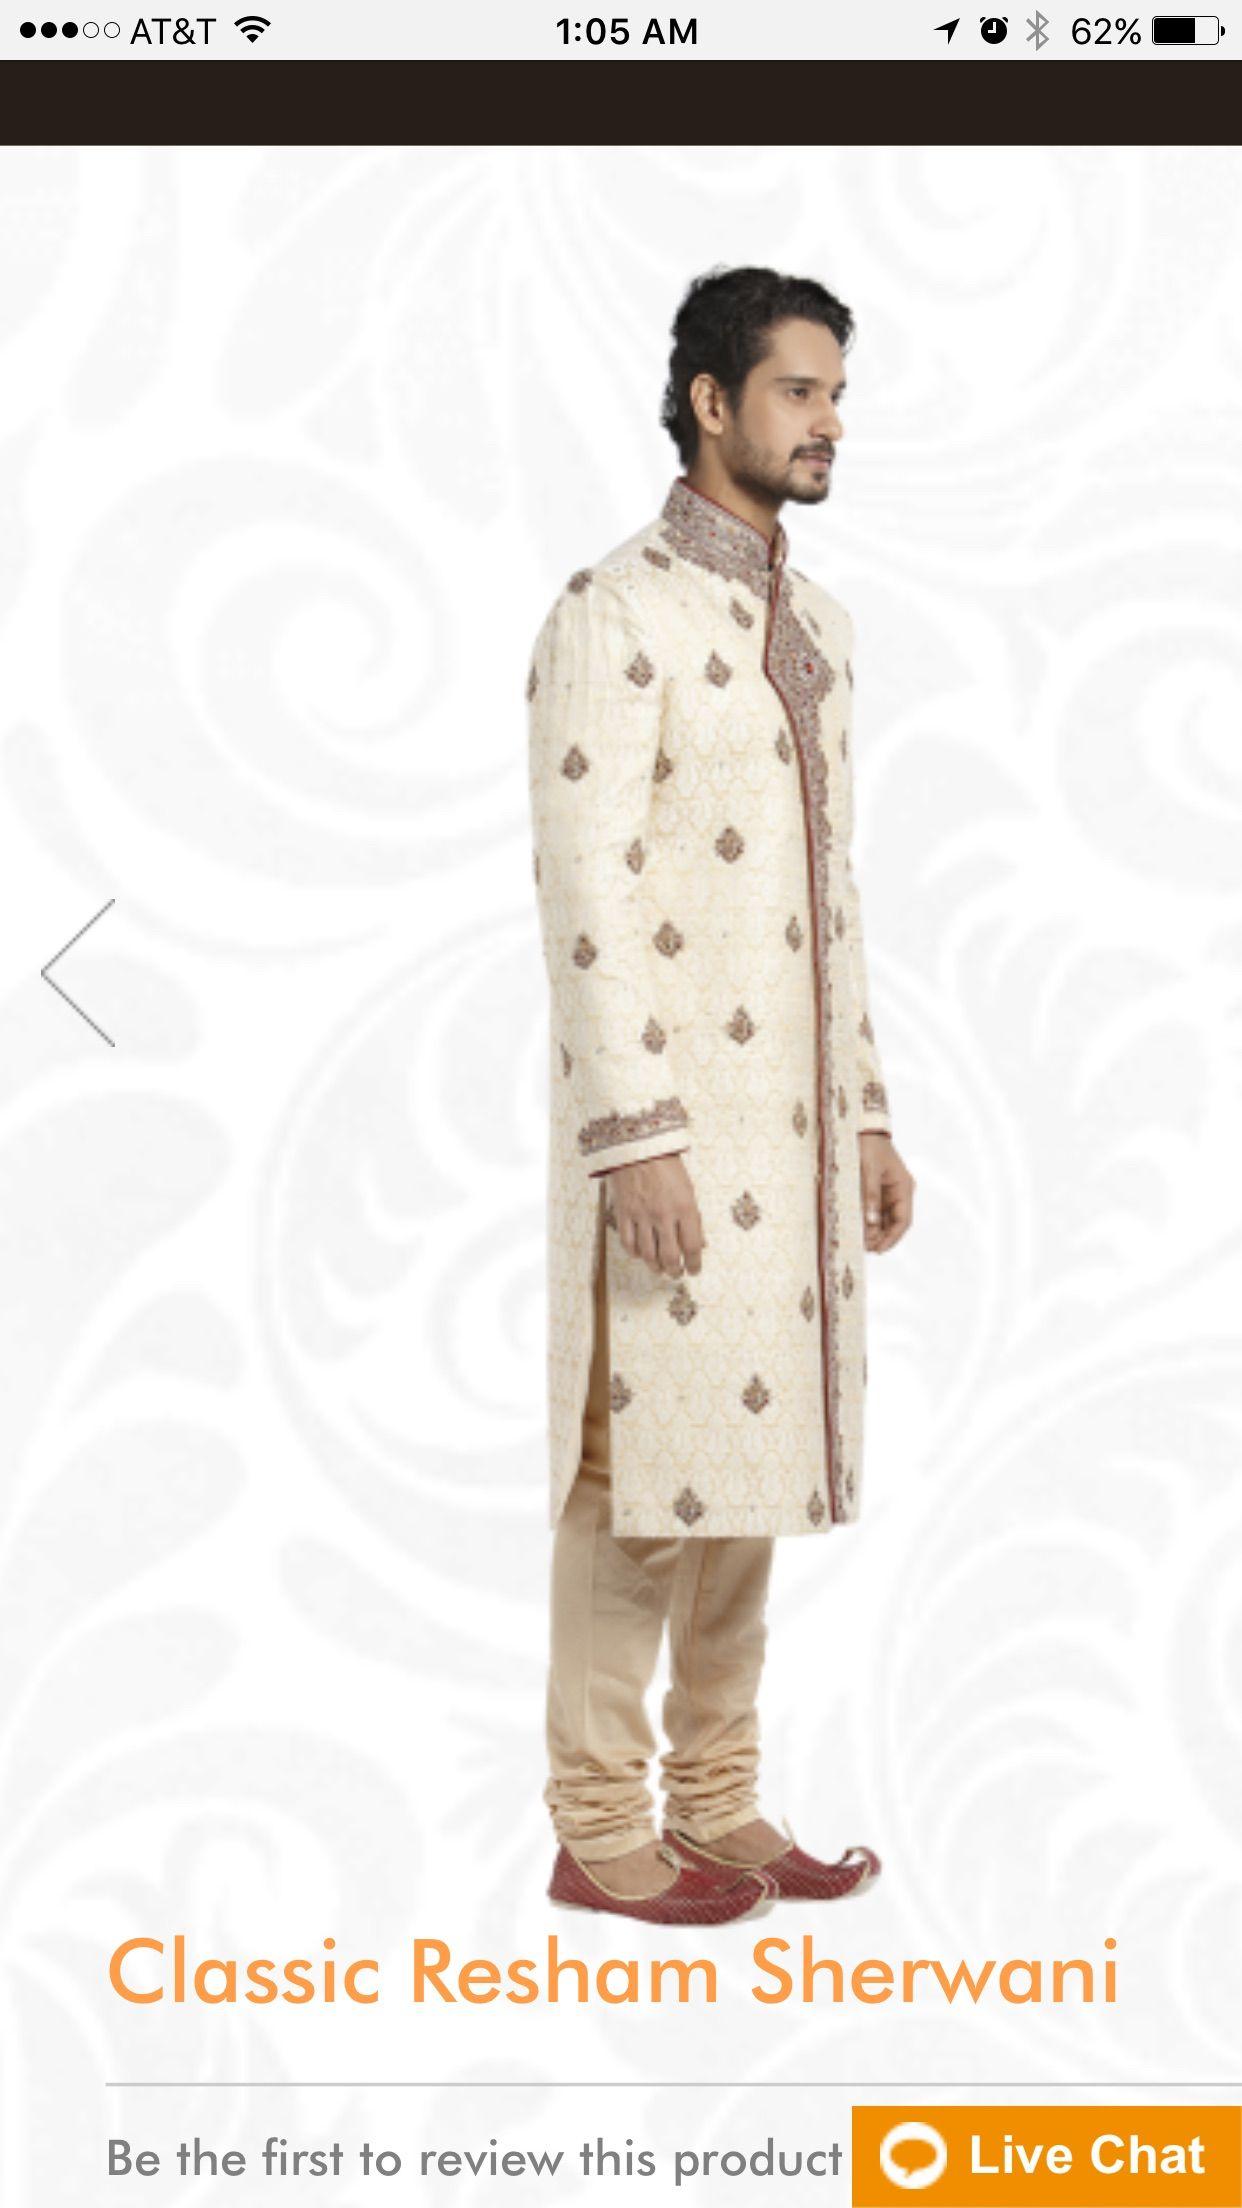 Velvet Embroidered Maroon Winter Sherwani Ismail Farid Men S Designer Pakistan Best Article Saudi Arabia Qatar Riyadh In 2020 Embroidered Wedding Sherwani Wedding Sherwani